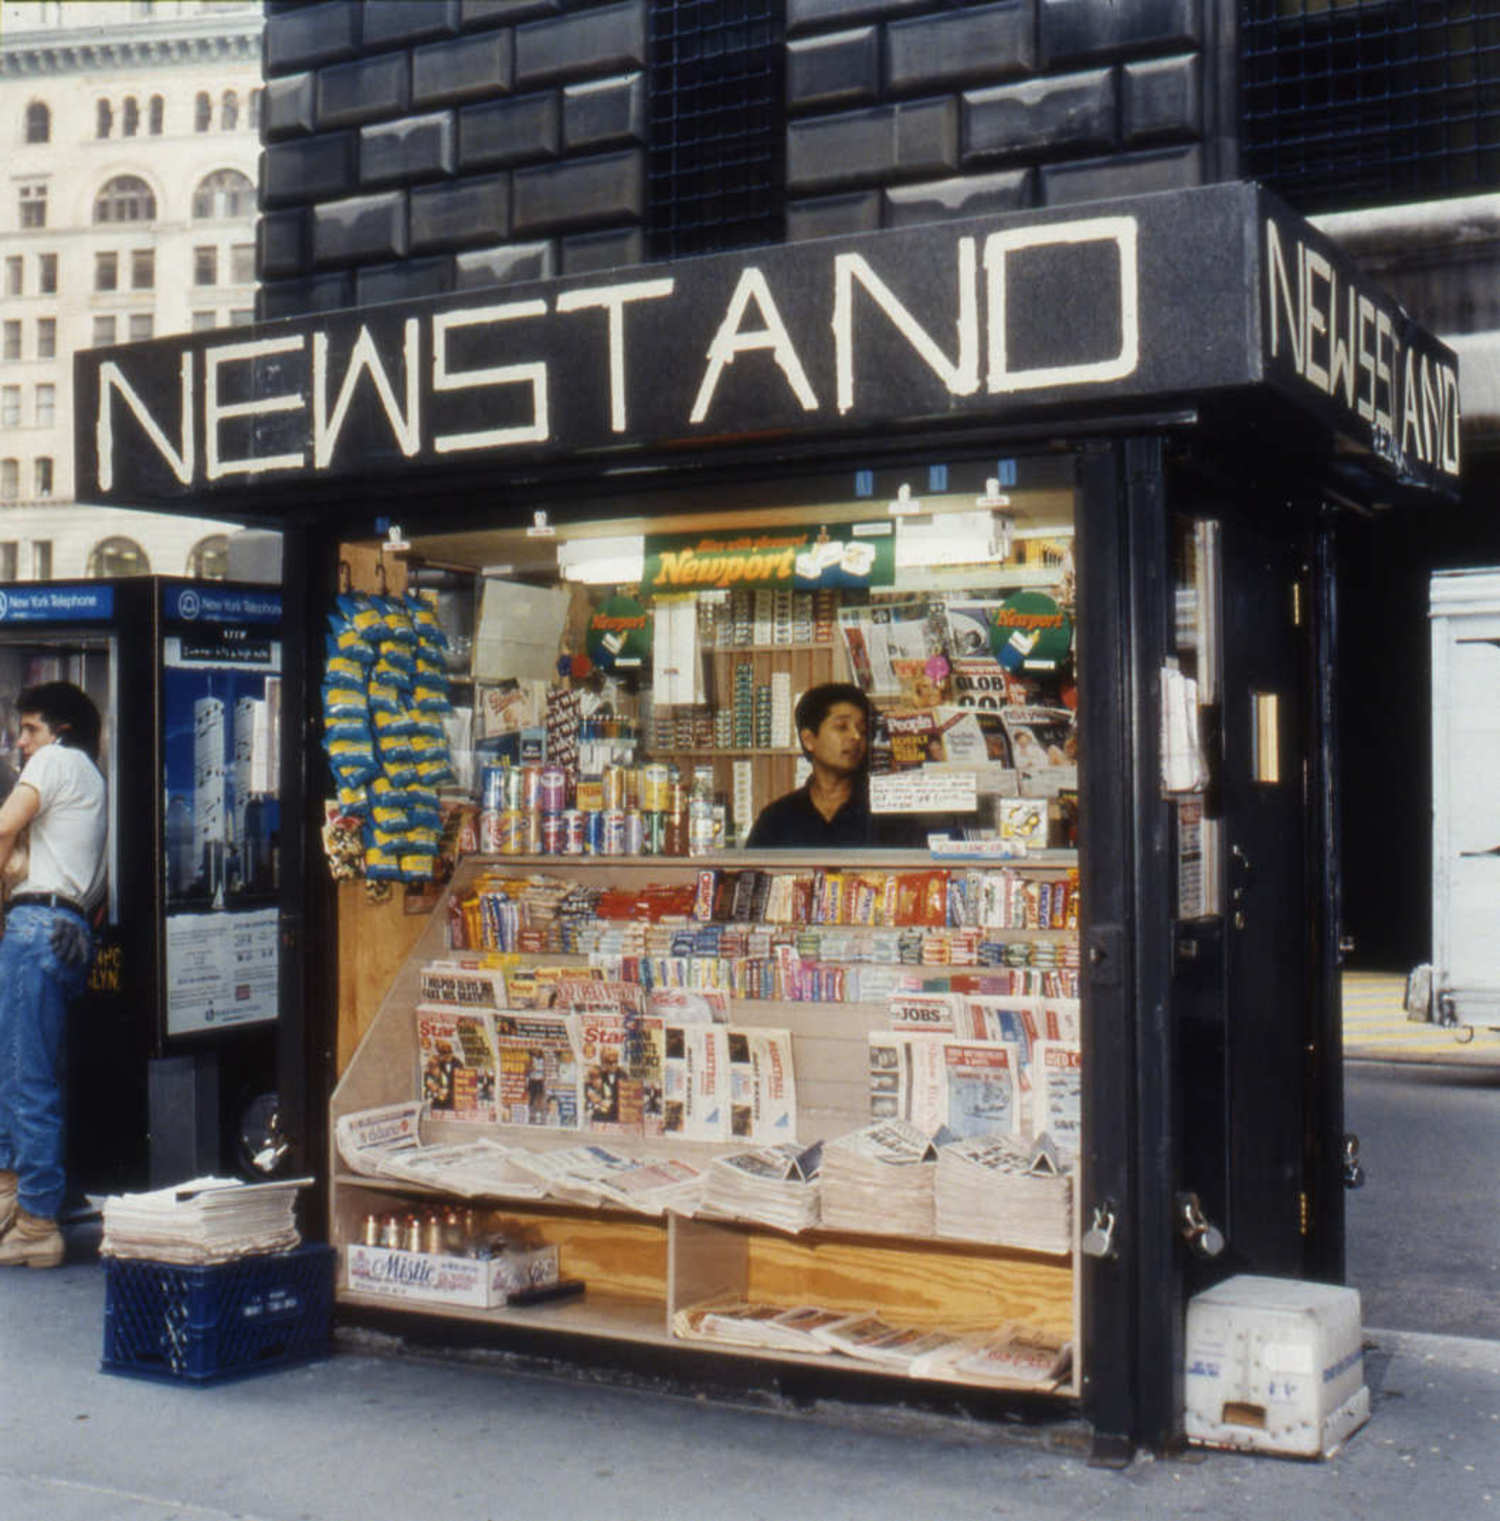 Newstand #14